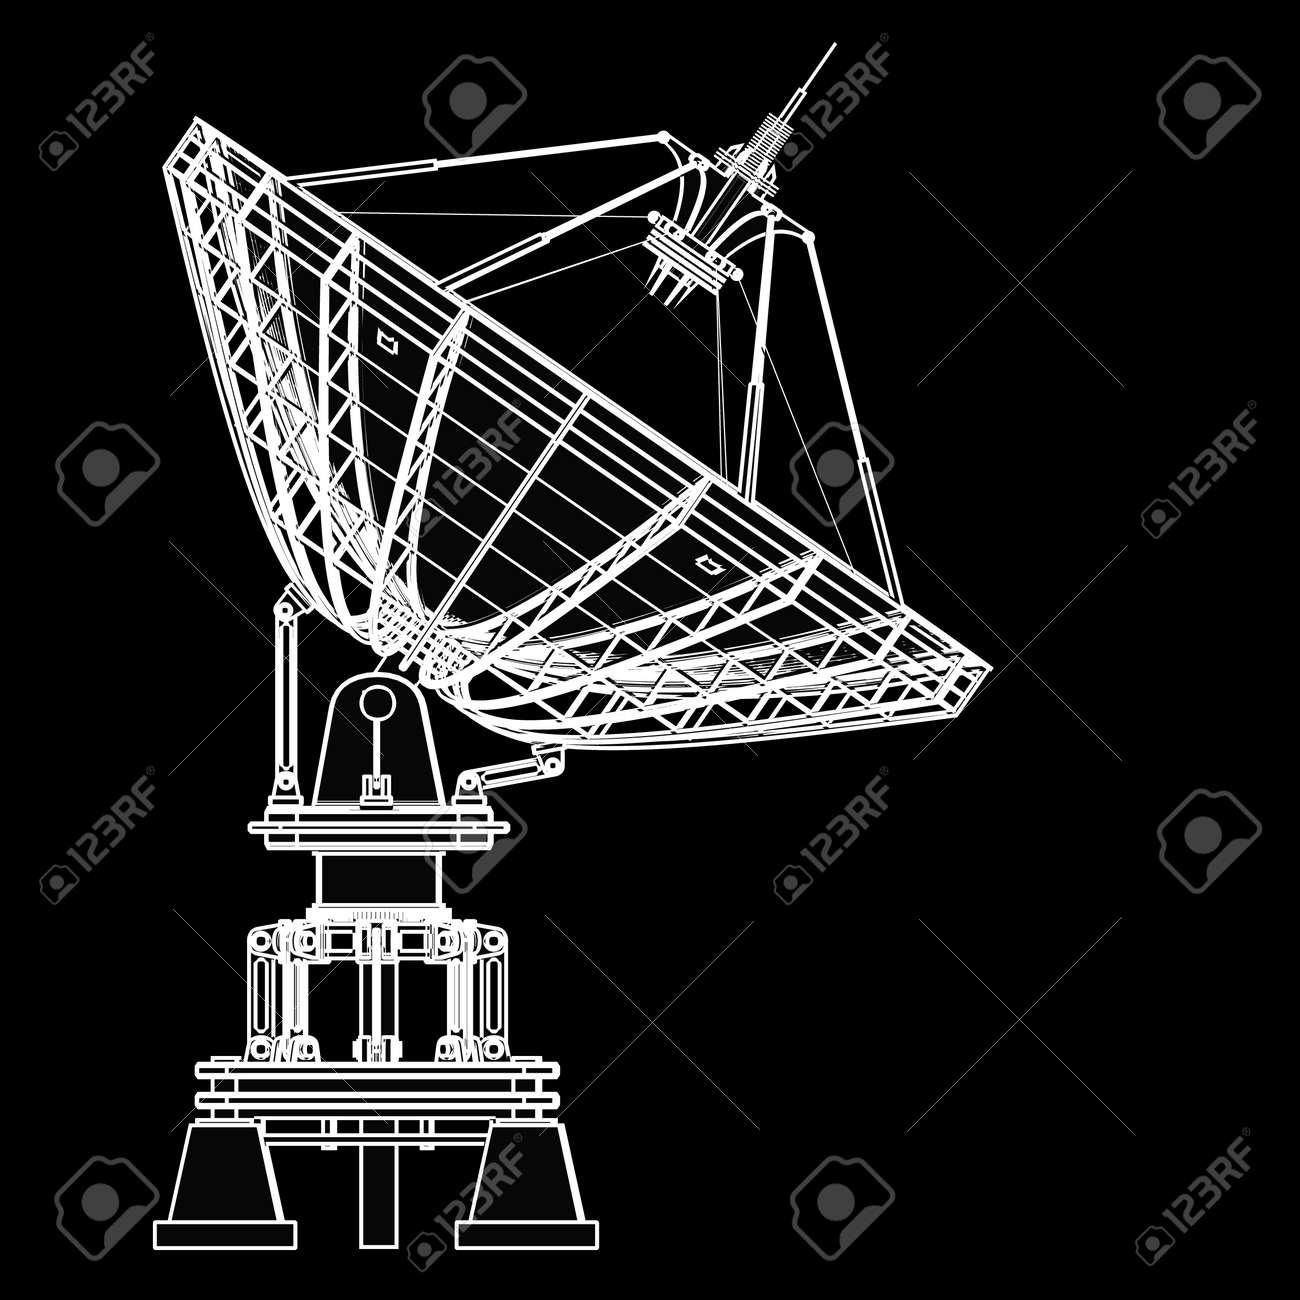 Satellite Dishes Antenna Doppler Radar Black Cartoon - Hawaii radar doppler